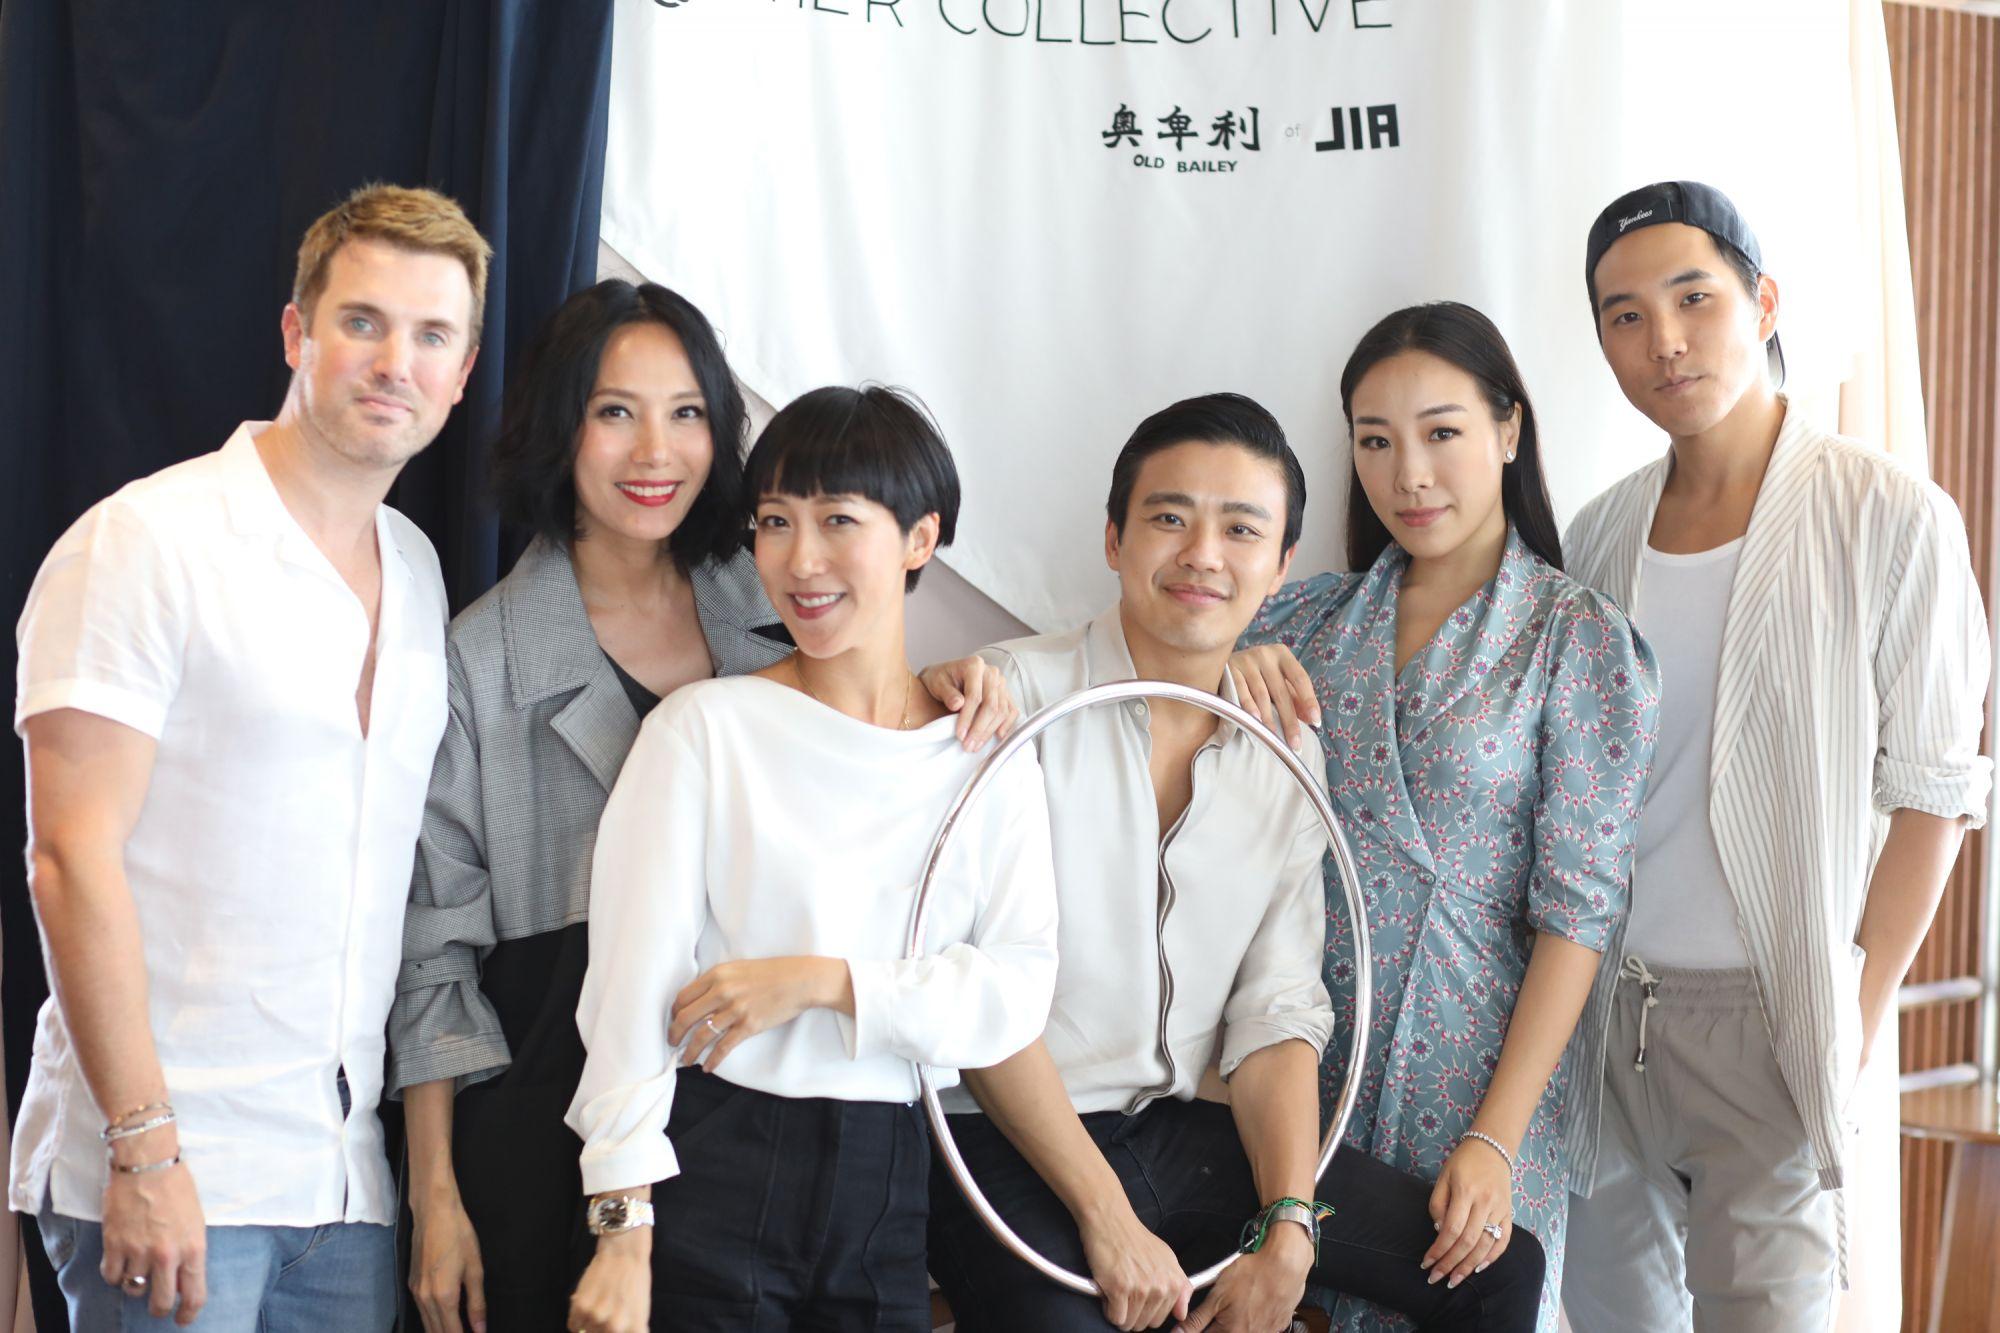 Nick Troedson, Jaime Ku, Denise Ho, Jonathan Cheung, Feiping Chang, Calvin Wang